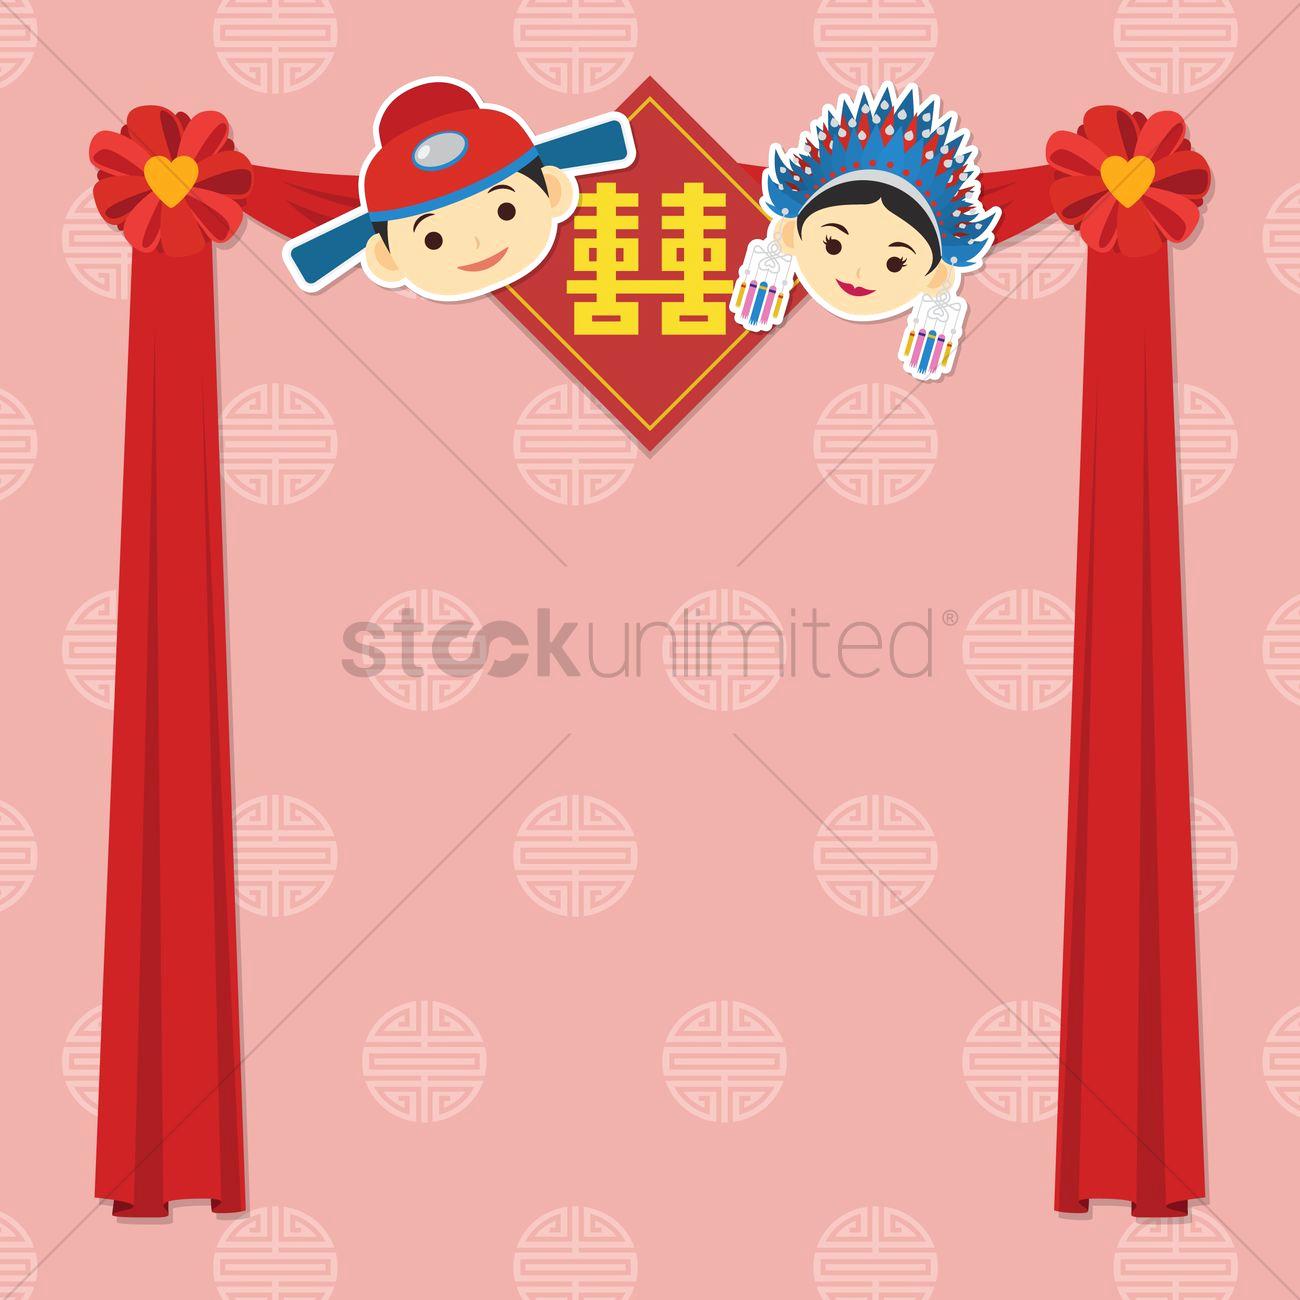 Chinese Wedding Invitation Wordings Inspirational Chinese Wedding Invitation